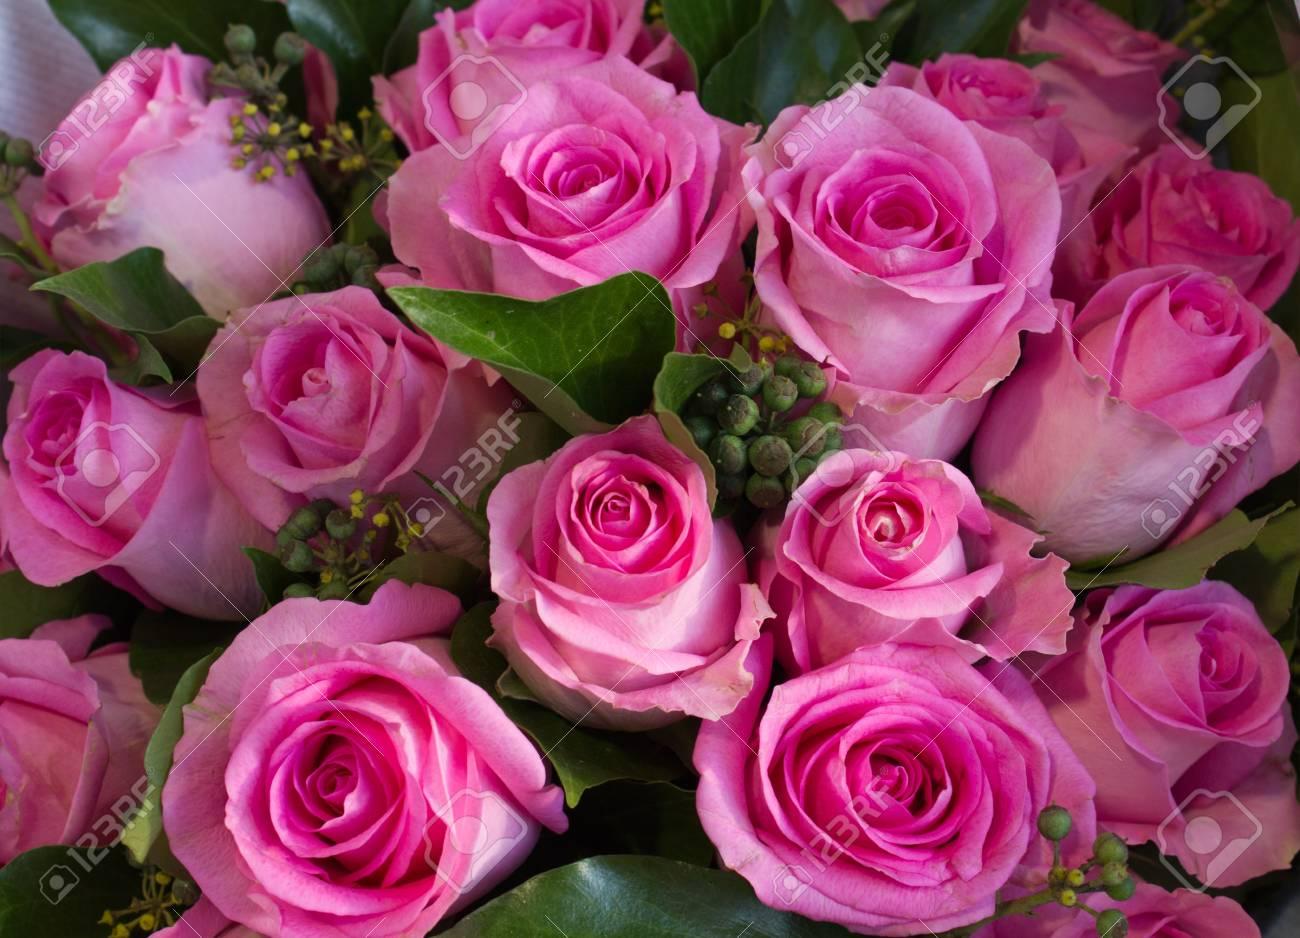 Blush Rosas De Color Rosa Colores Románticos De Amor Fotos